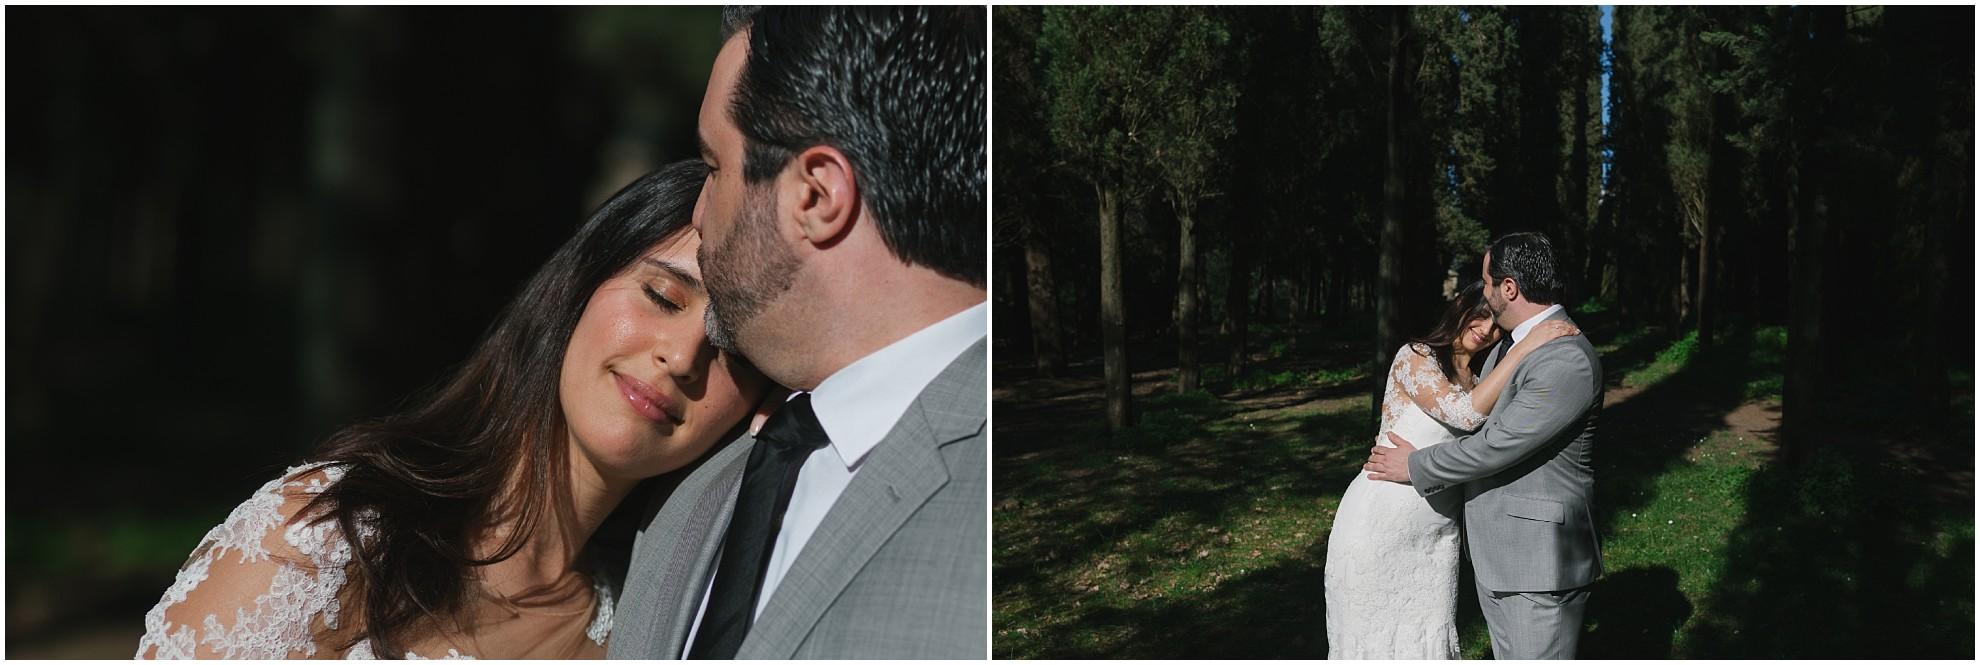 florence-wedding-photographer-041